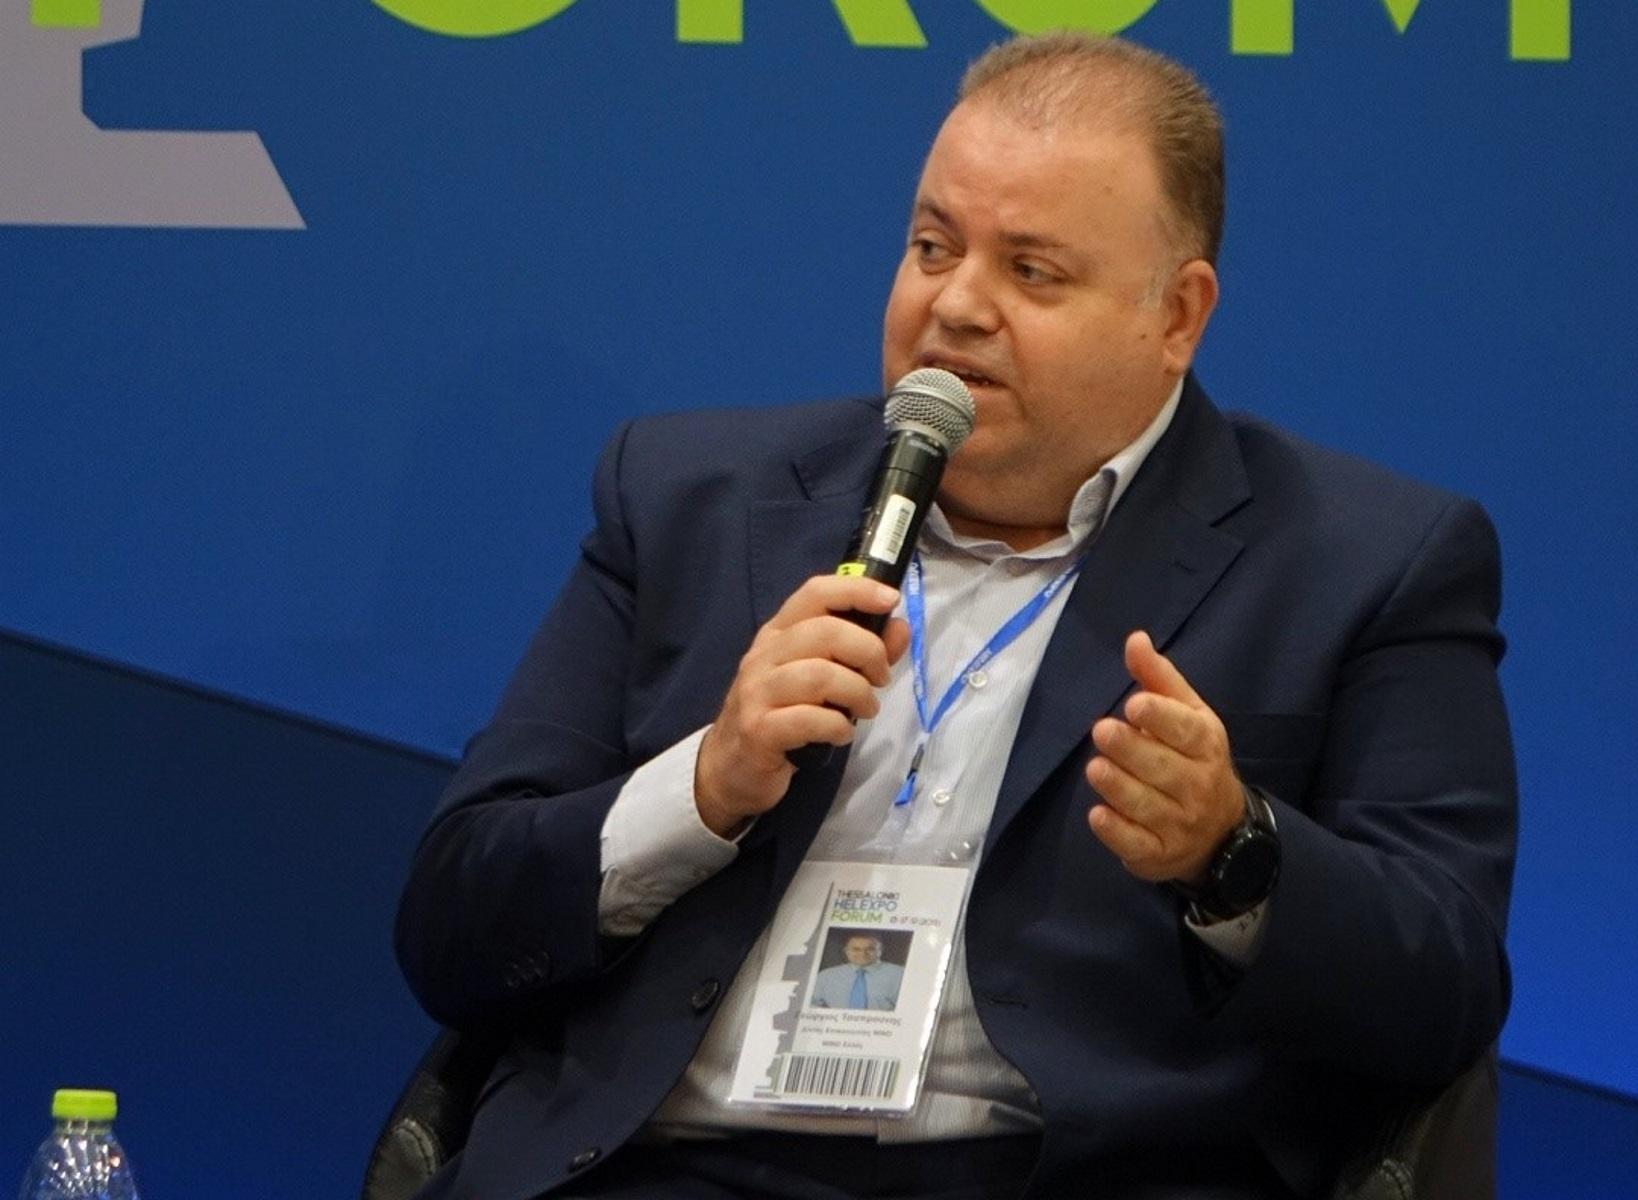 Wind Ελλάς: «Πρέπει να επιταχύνουμε τις επενδύσεις σε δίκτυα νέας γενιάς στην περιφέρεια»